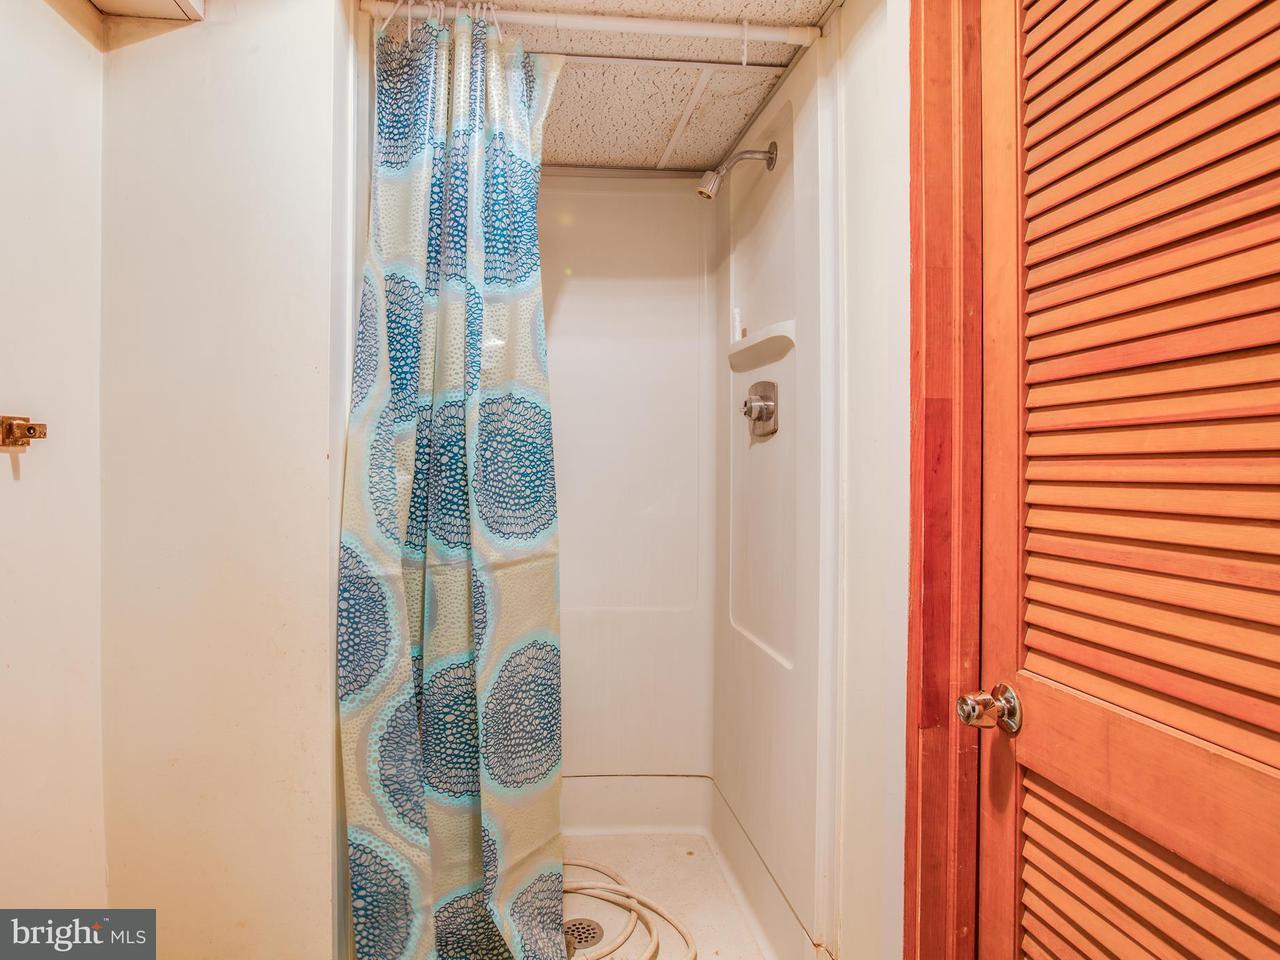 Additional photo for property listing at 808 Marye Street 808 Marye Street Fredericksburg, Виргиния 22401 Соединенные Штаты